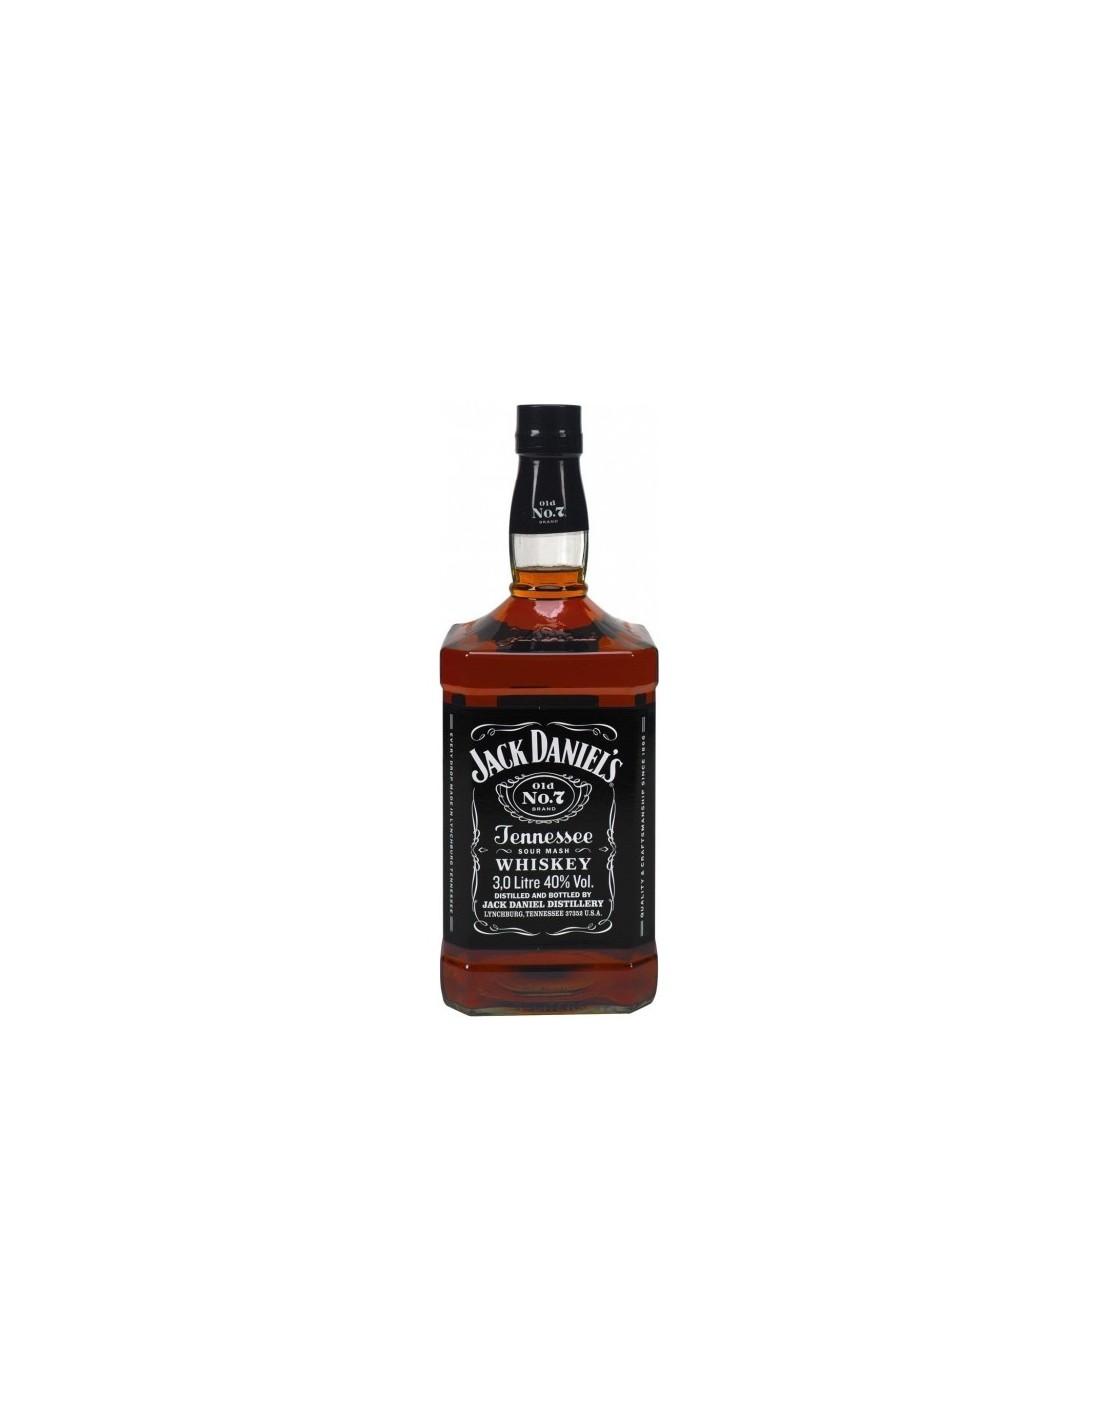 Whisky Bourbon Jack Daniel's, 40% alc., 3L, America